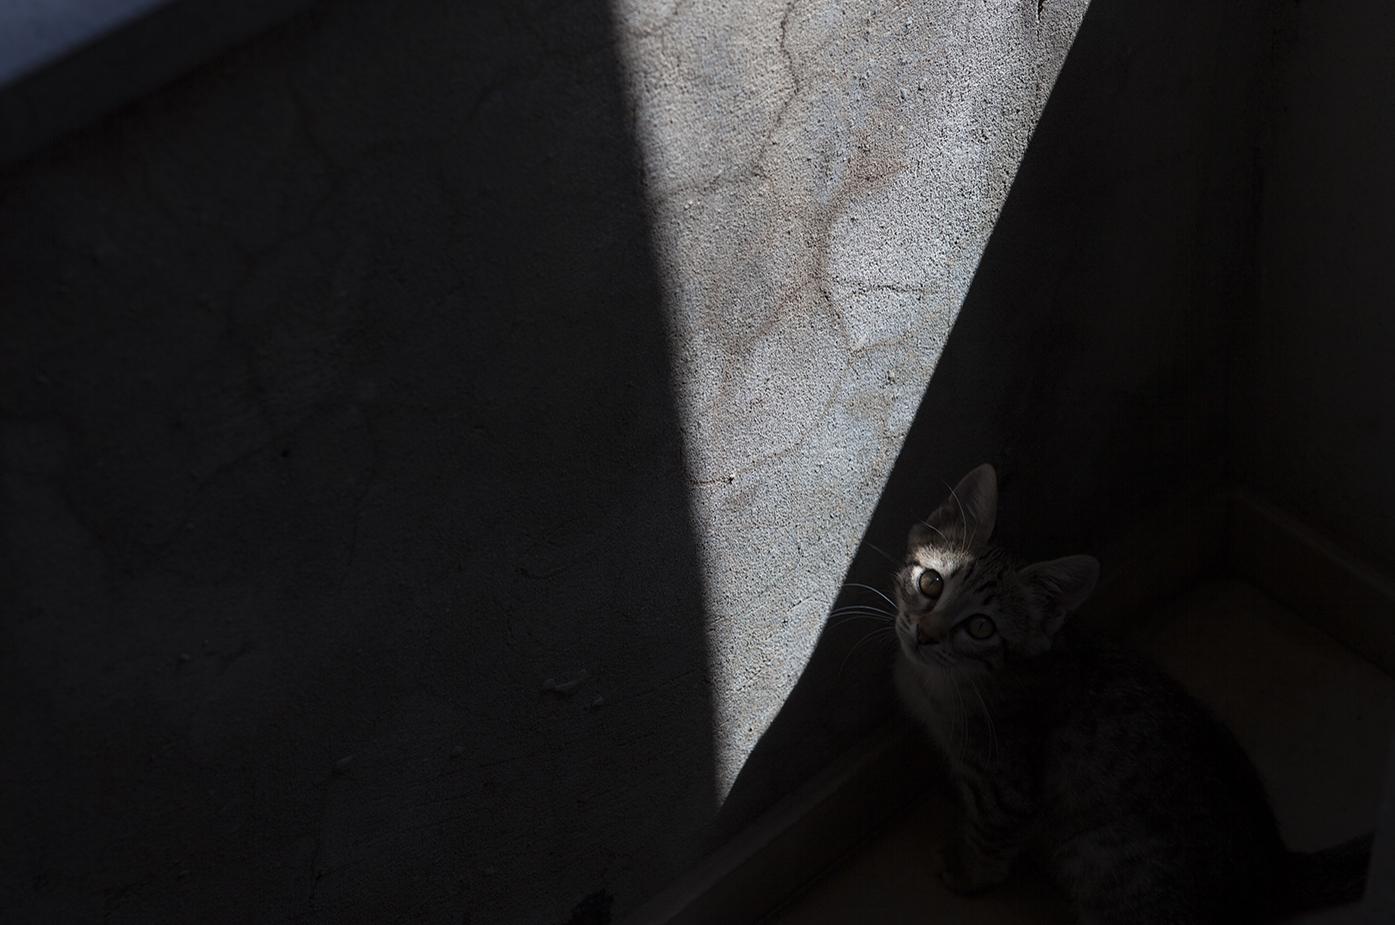 Cat Title